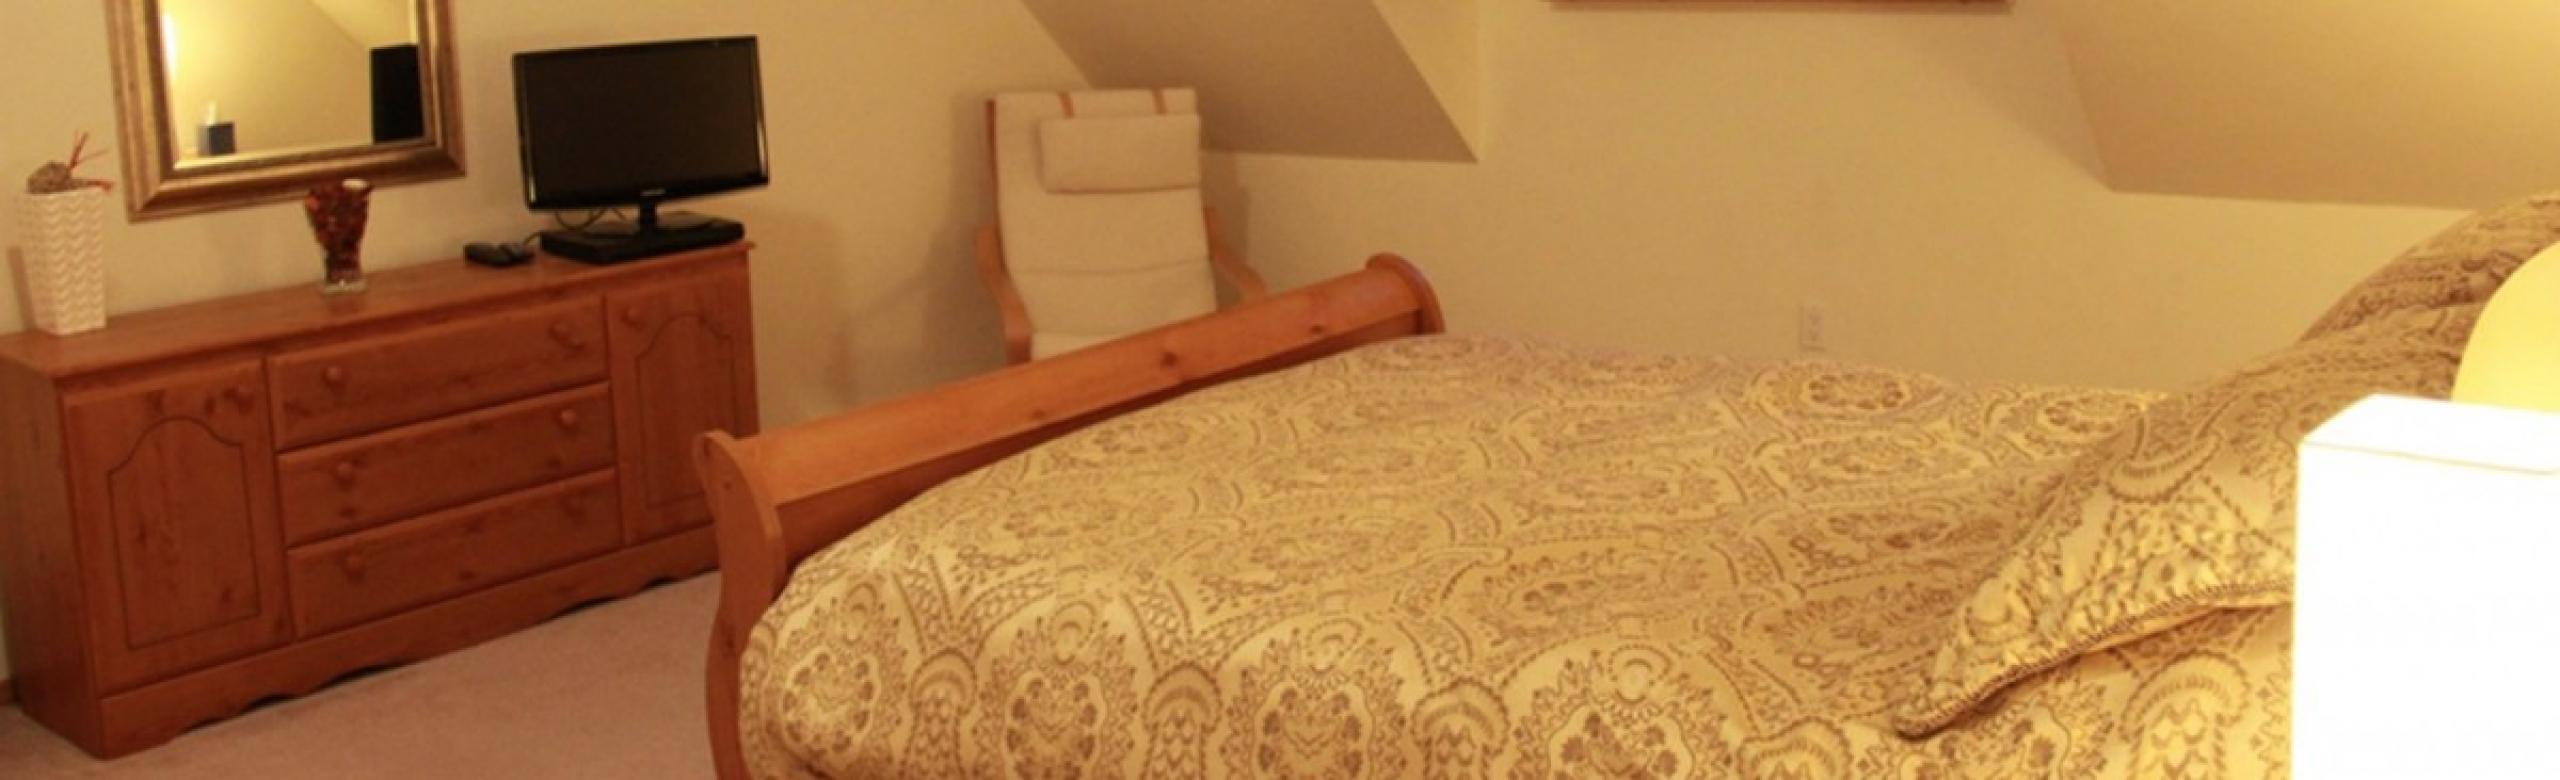 bedroom 2 slider 4